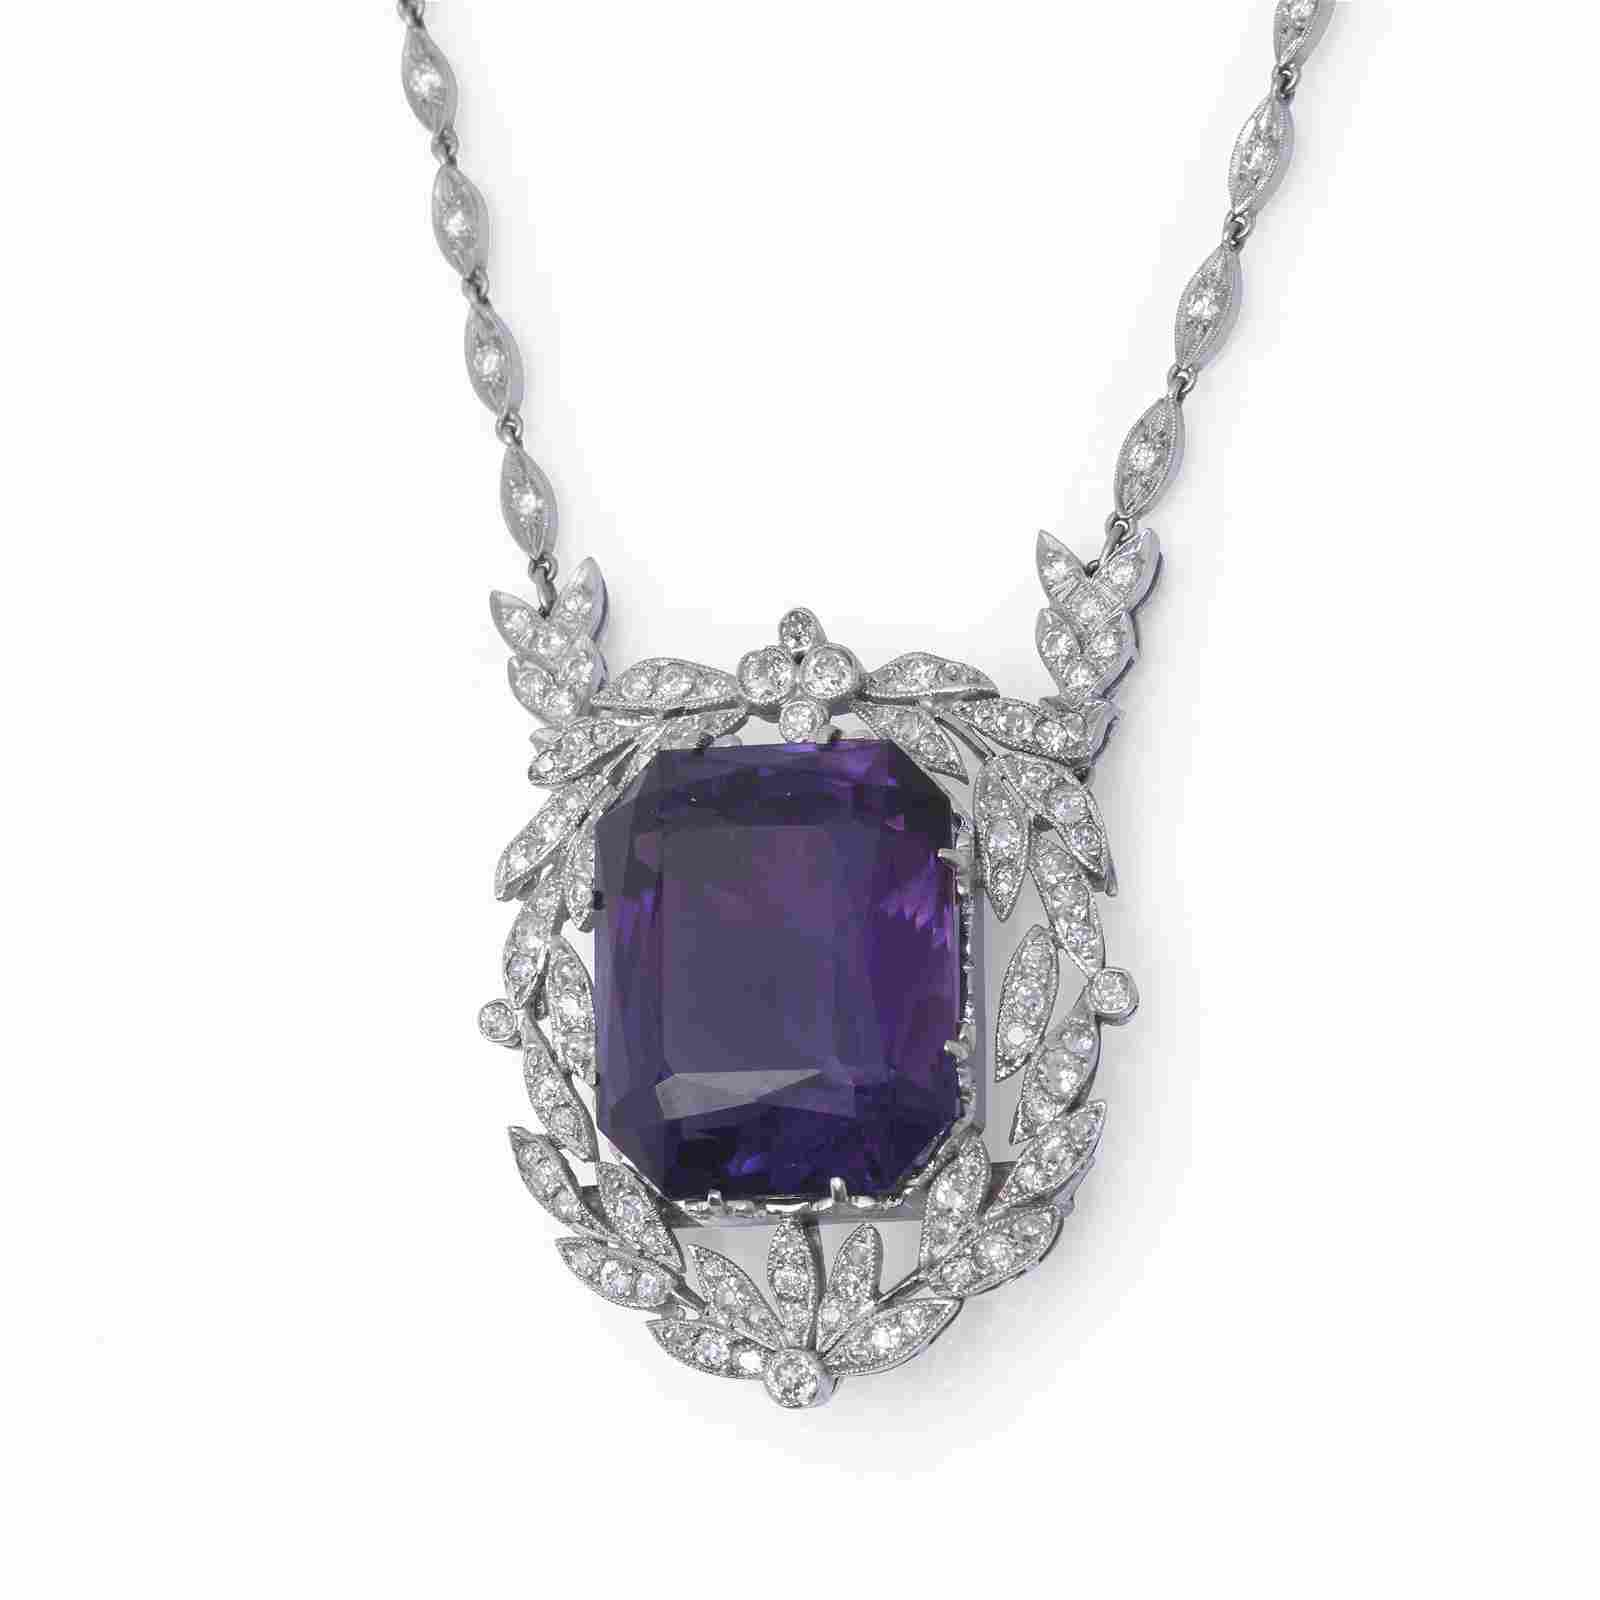 An amethyst, diamond, and platinum pendant brooch,